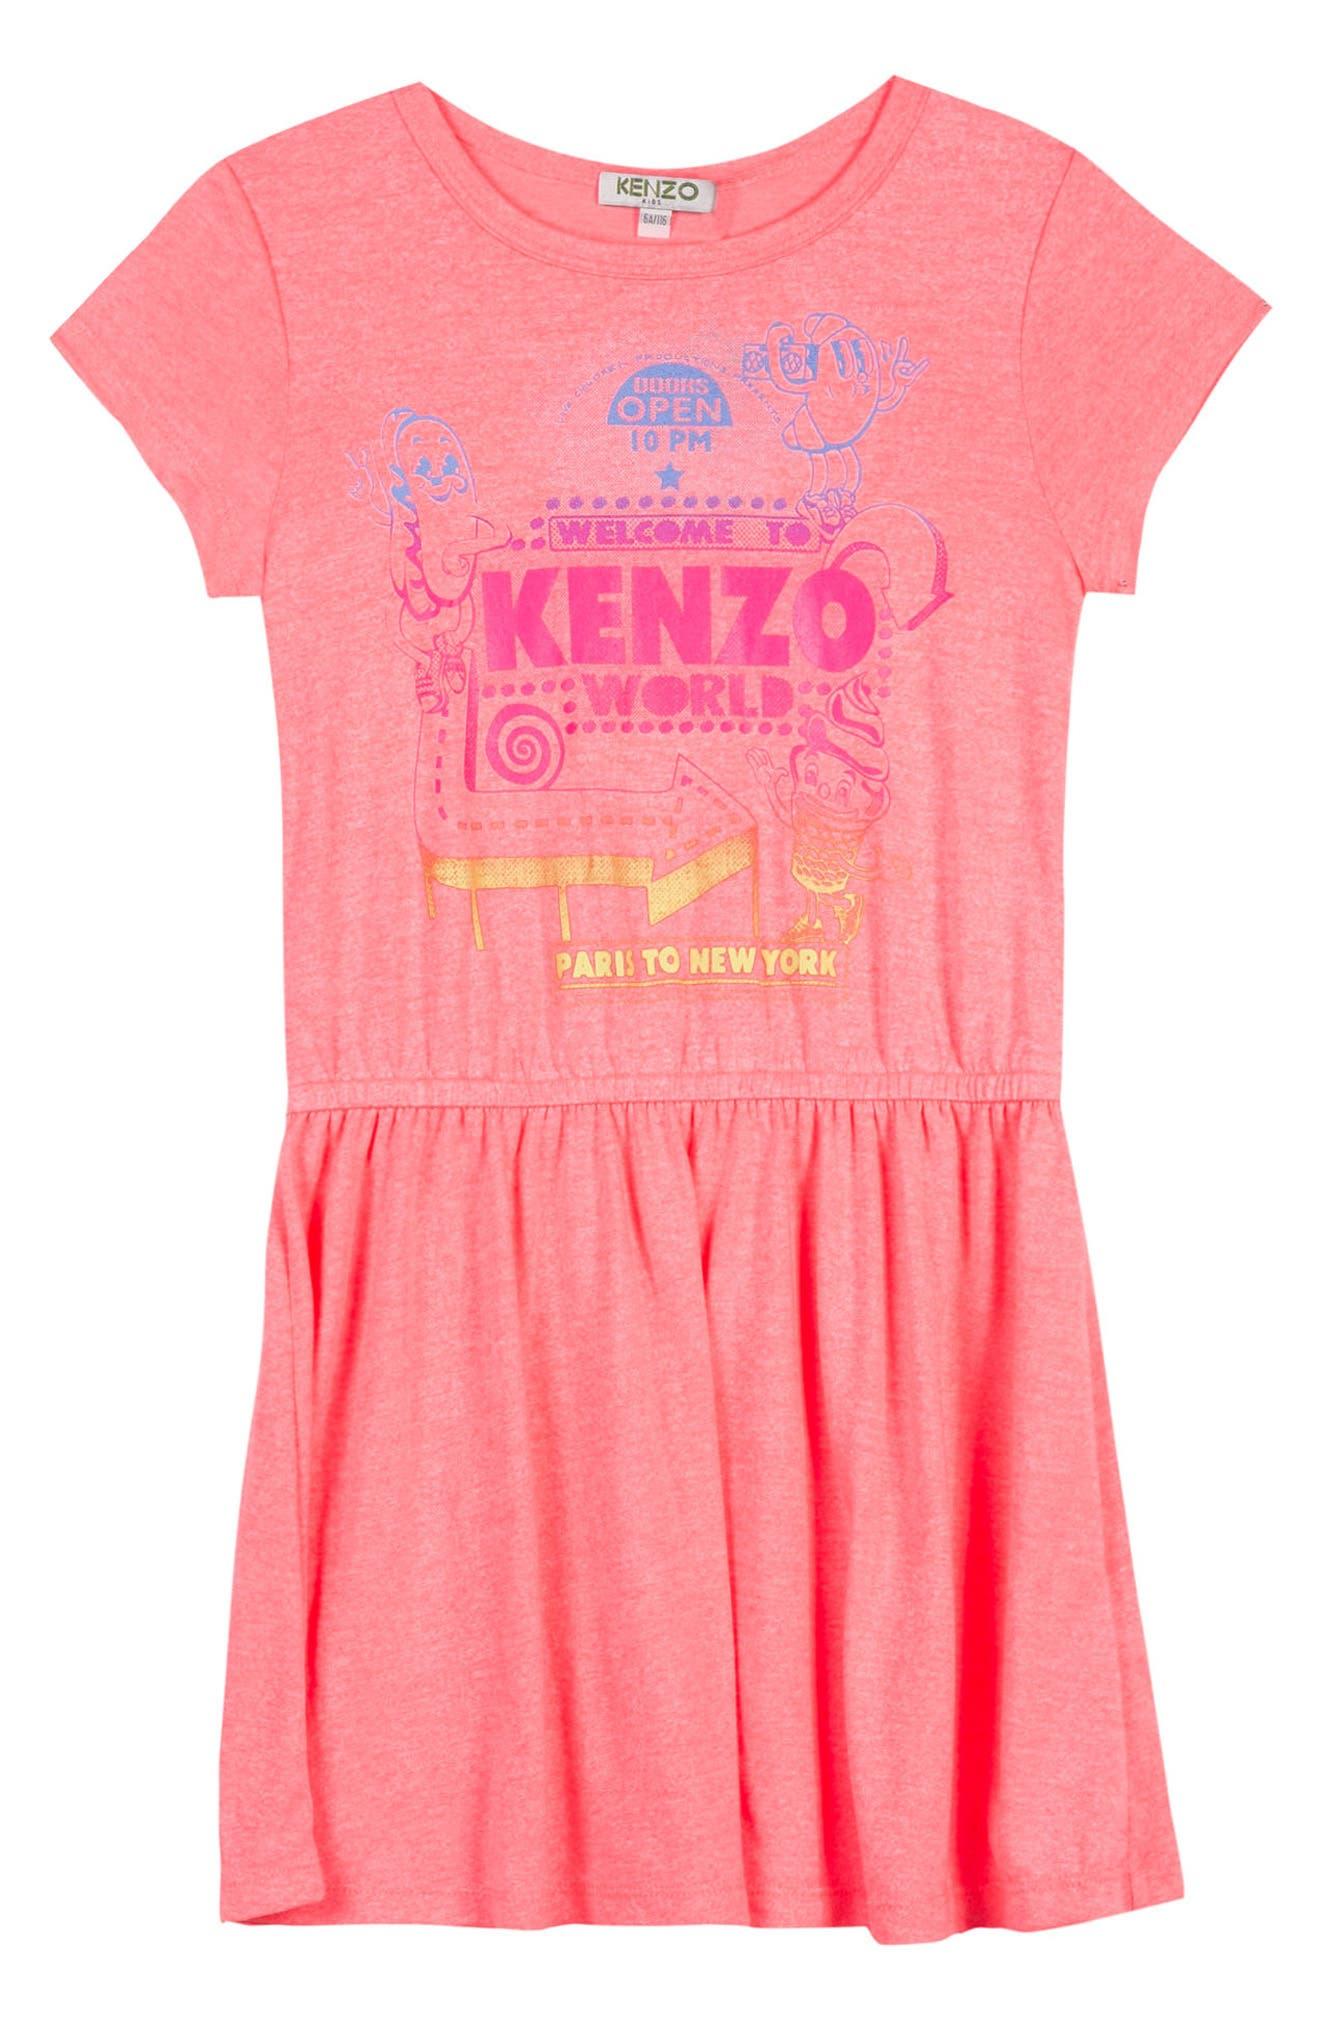 KENZO Logo Skater Dress, Main, color, 950